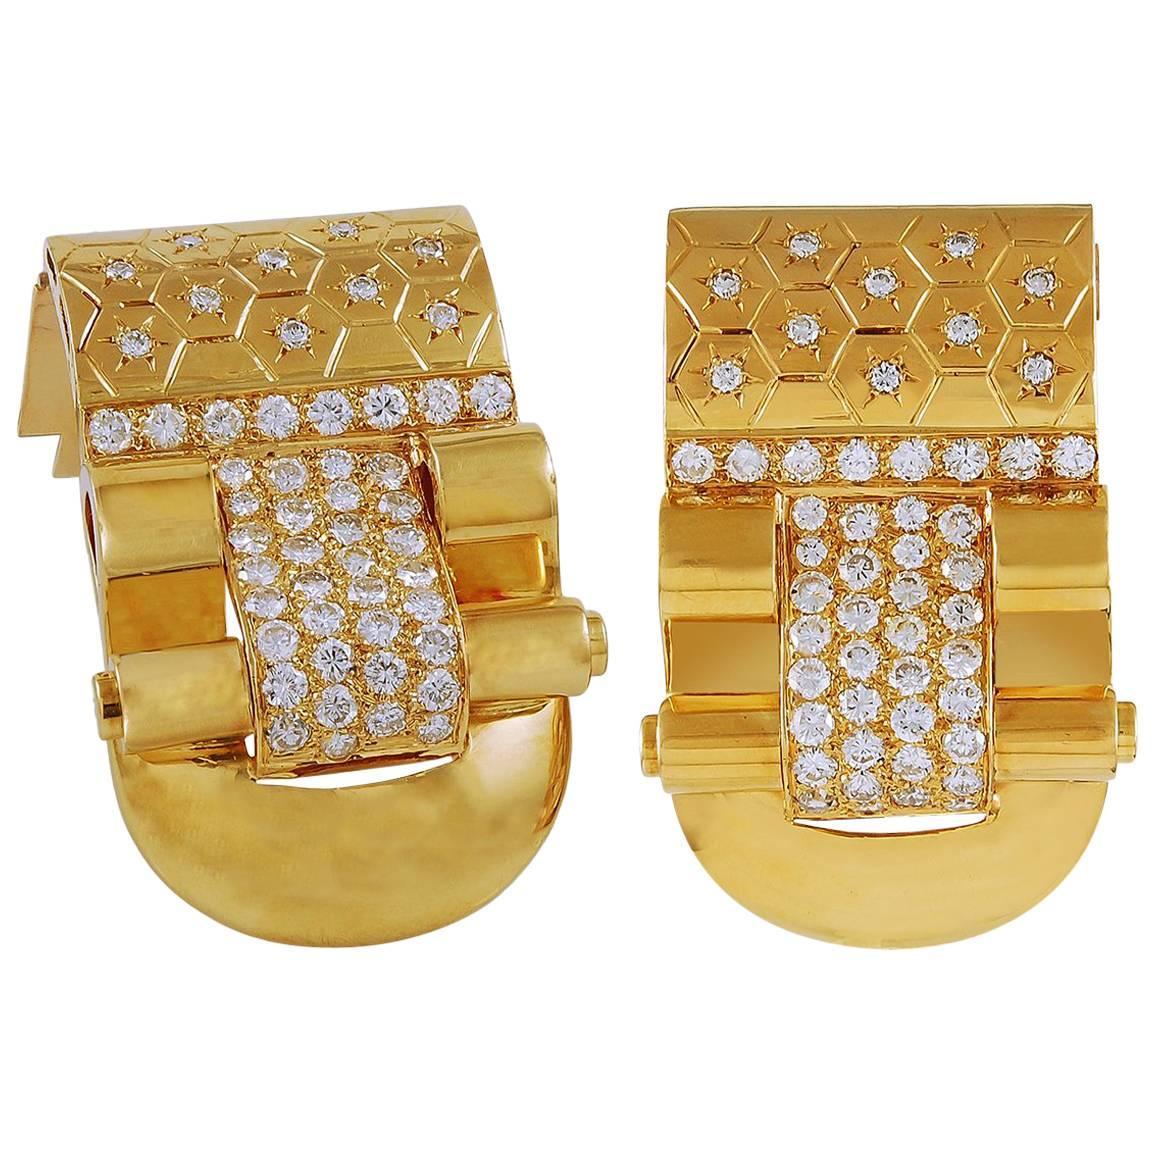 Van Cleef & Arpels Diamond Ludo Gold Clips